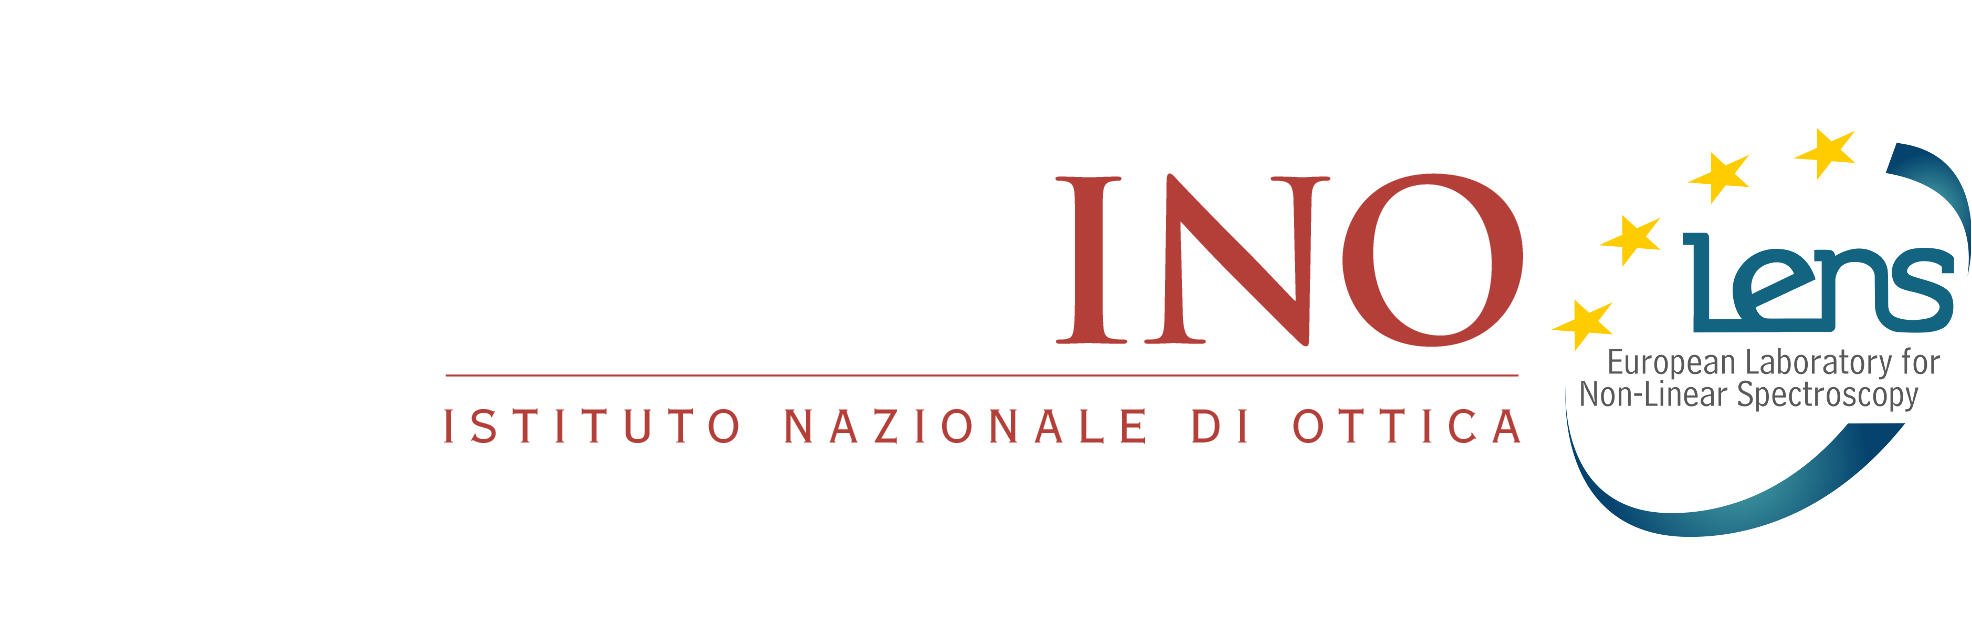 Notice 2018